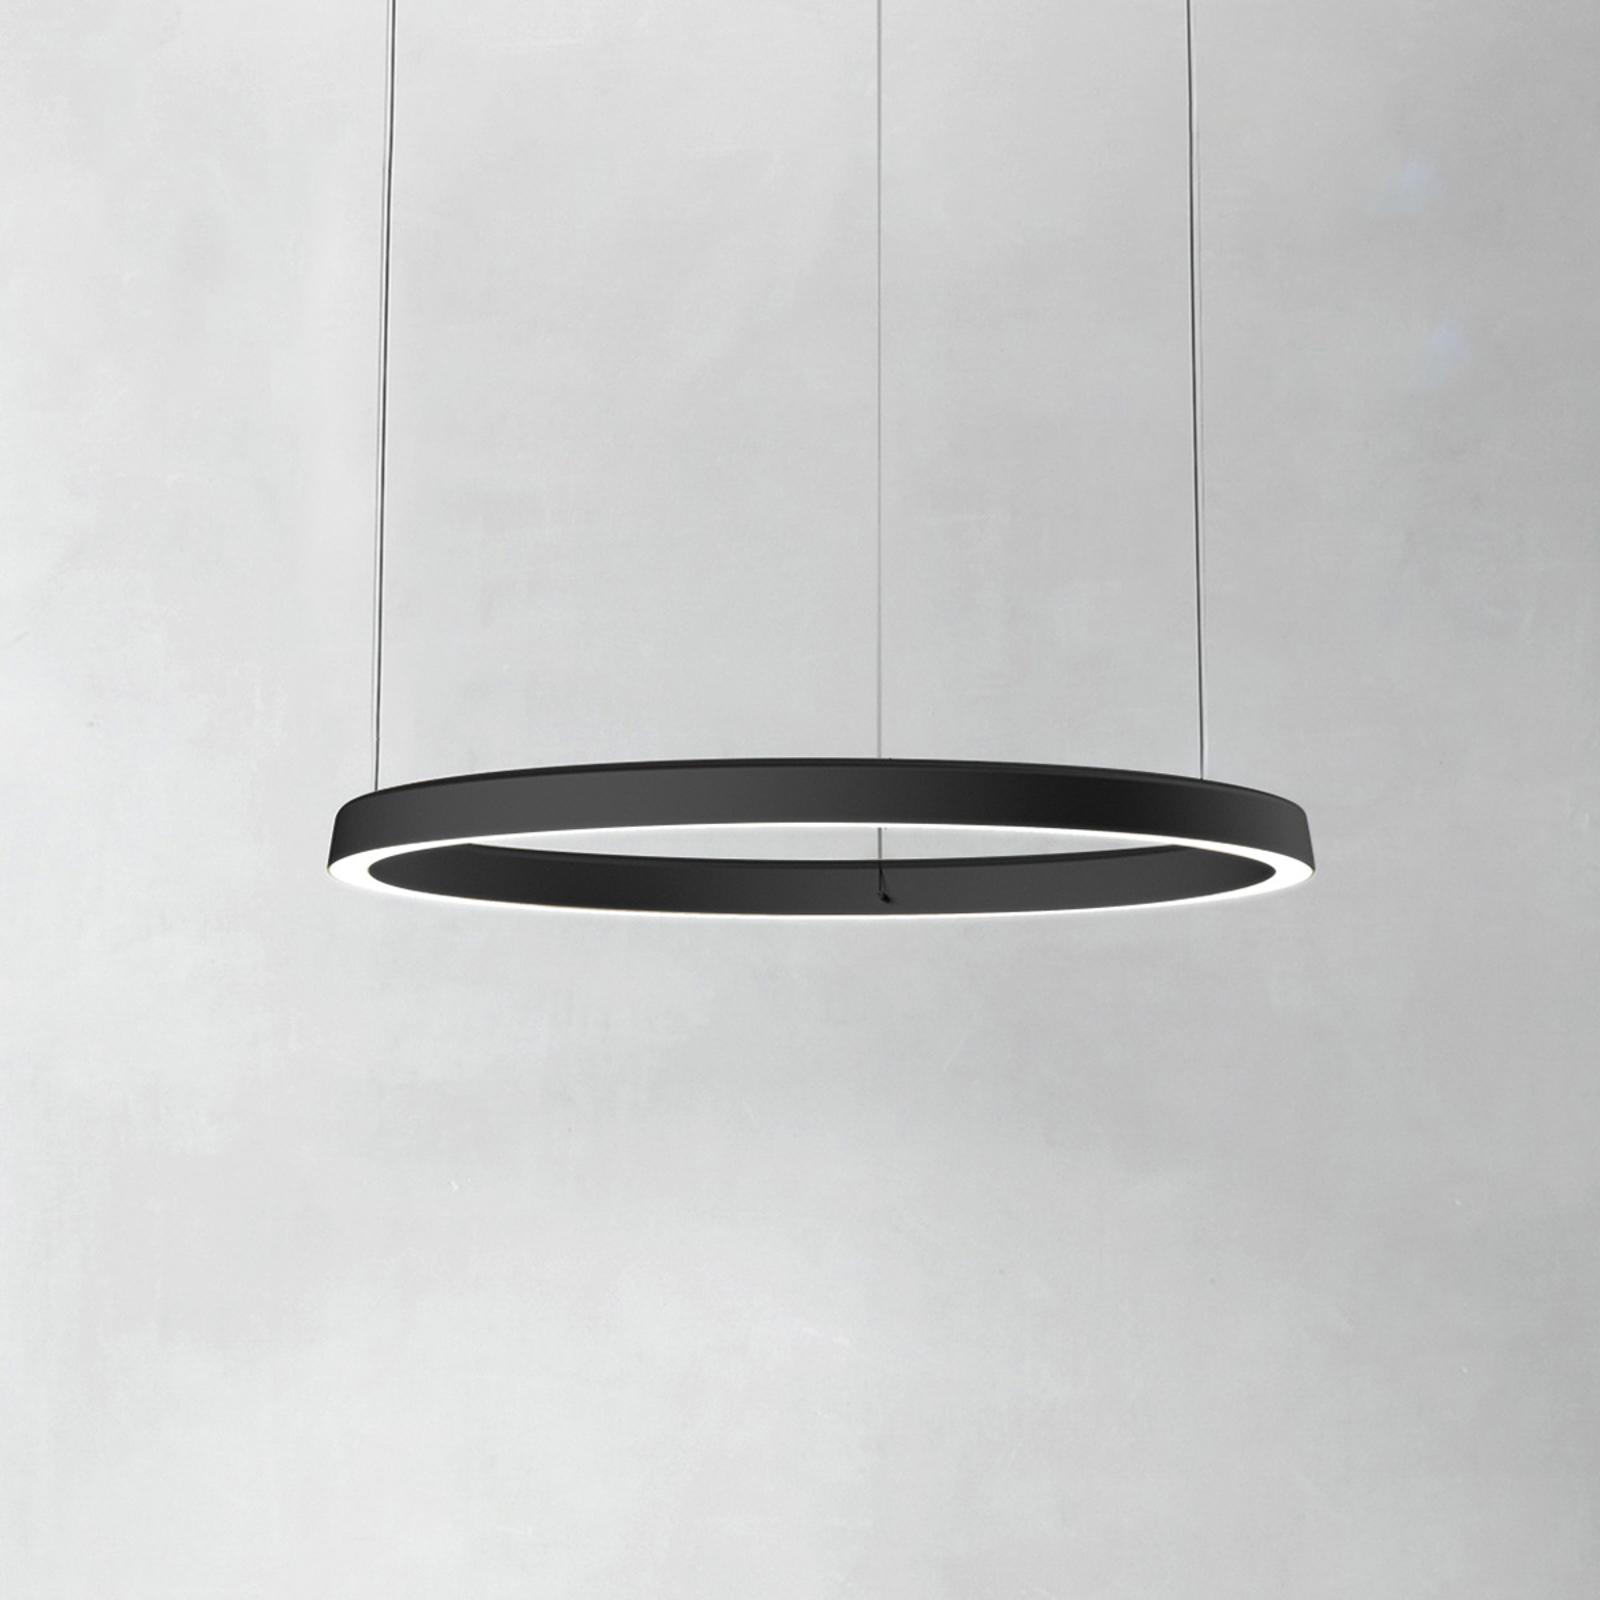 Luceplan Compendium Circle 72cm, schwarz